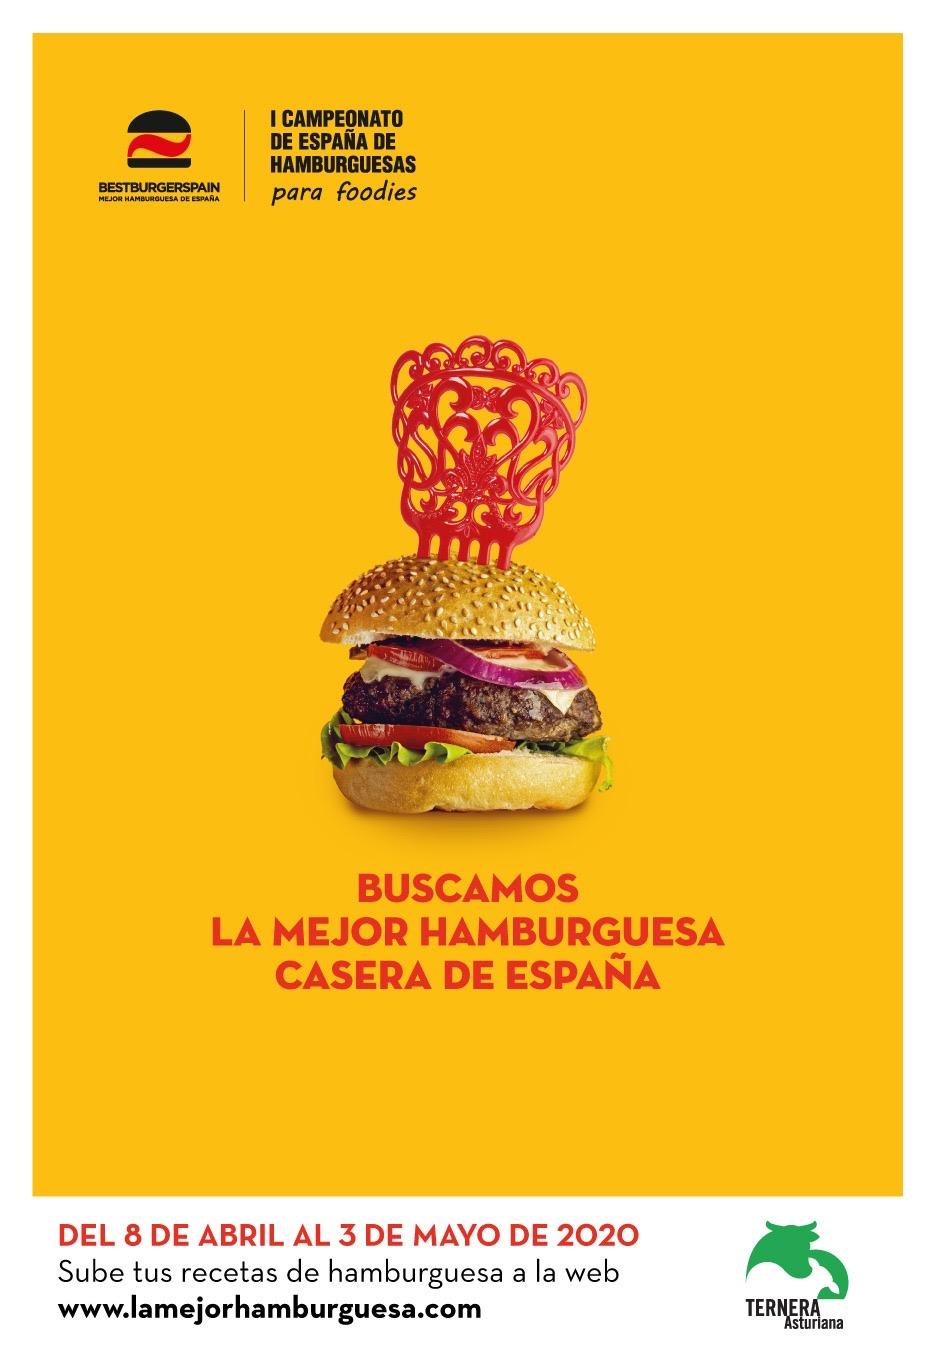 LA MEJOR HAMBURGUESA CASERA DE ESPAÑA